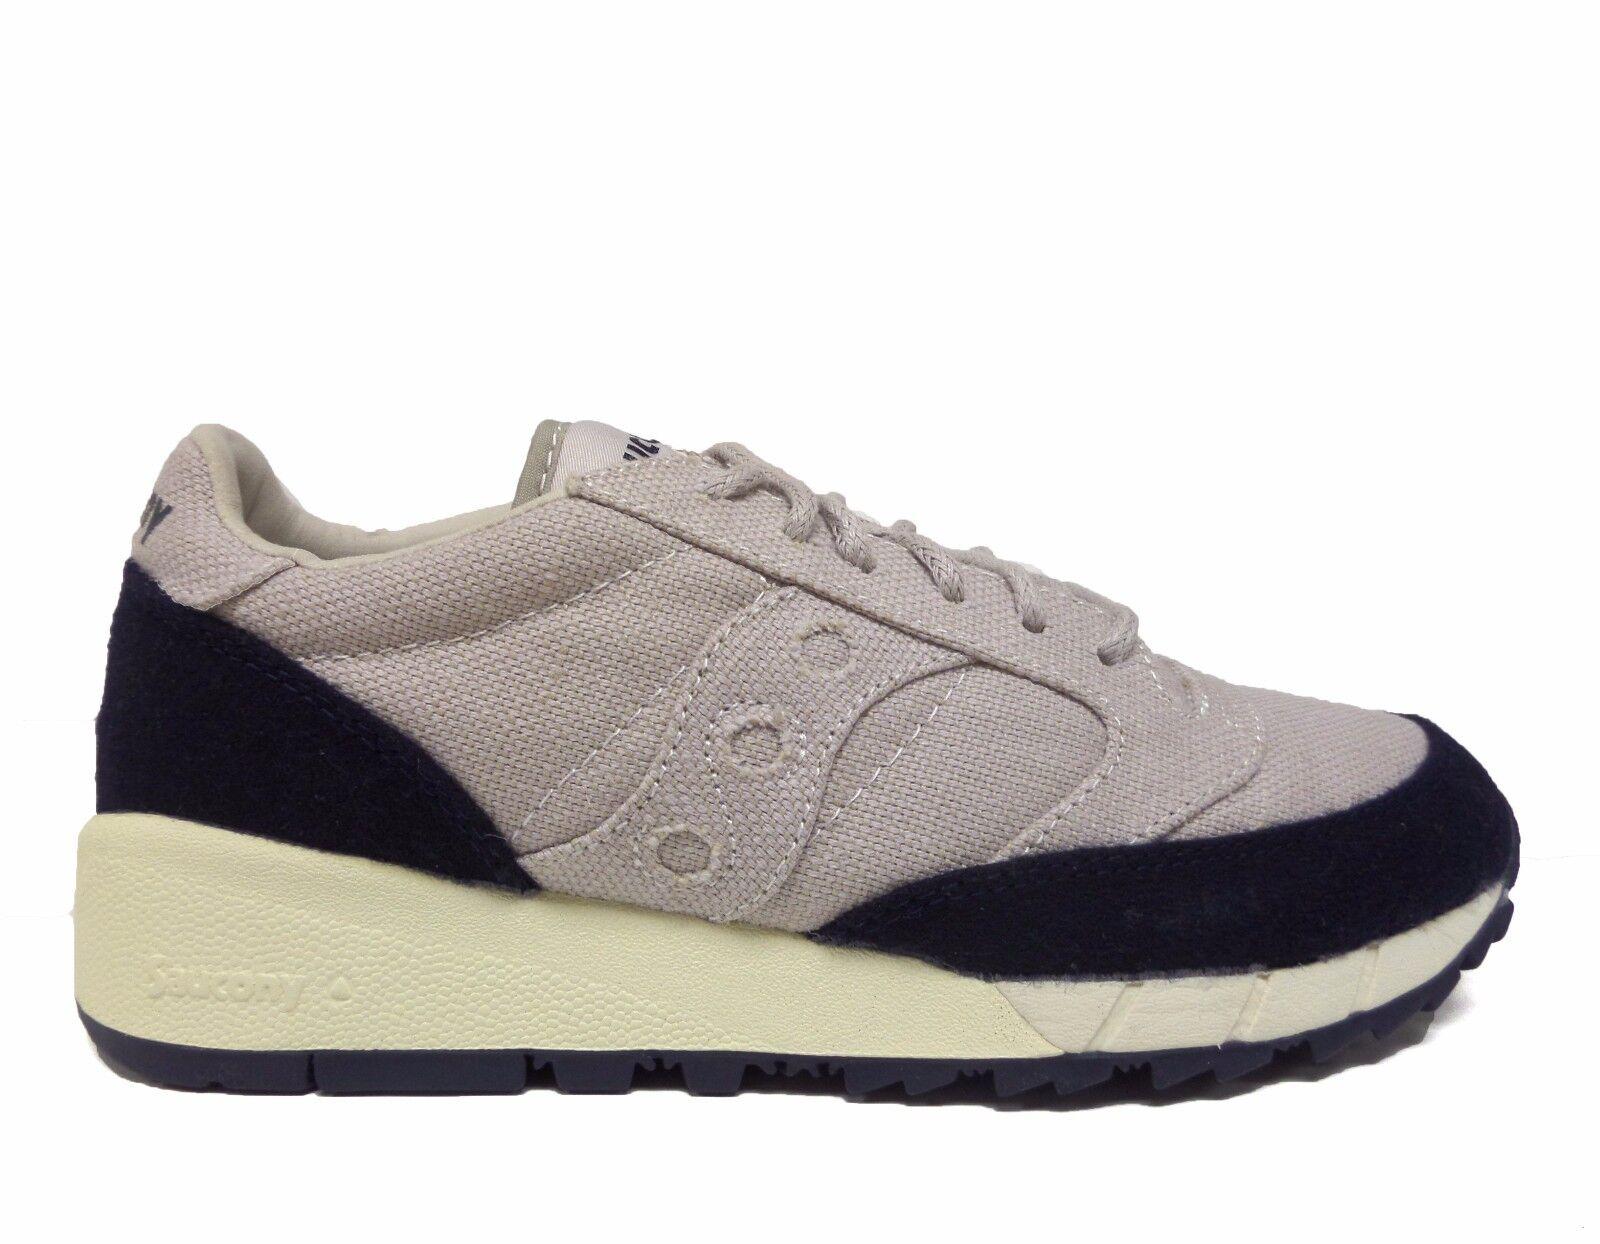 Saucony Men's ORIGINAL JAZZ '91 shoes Light Grey Black S70216-8 a